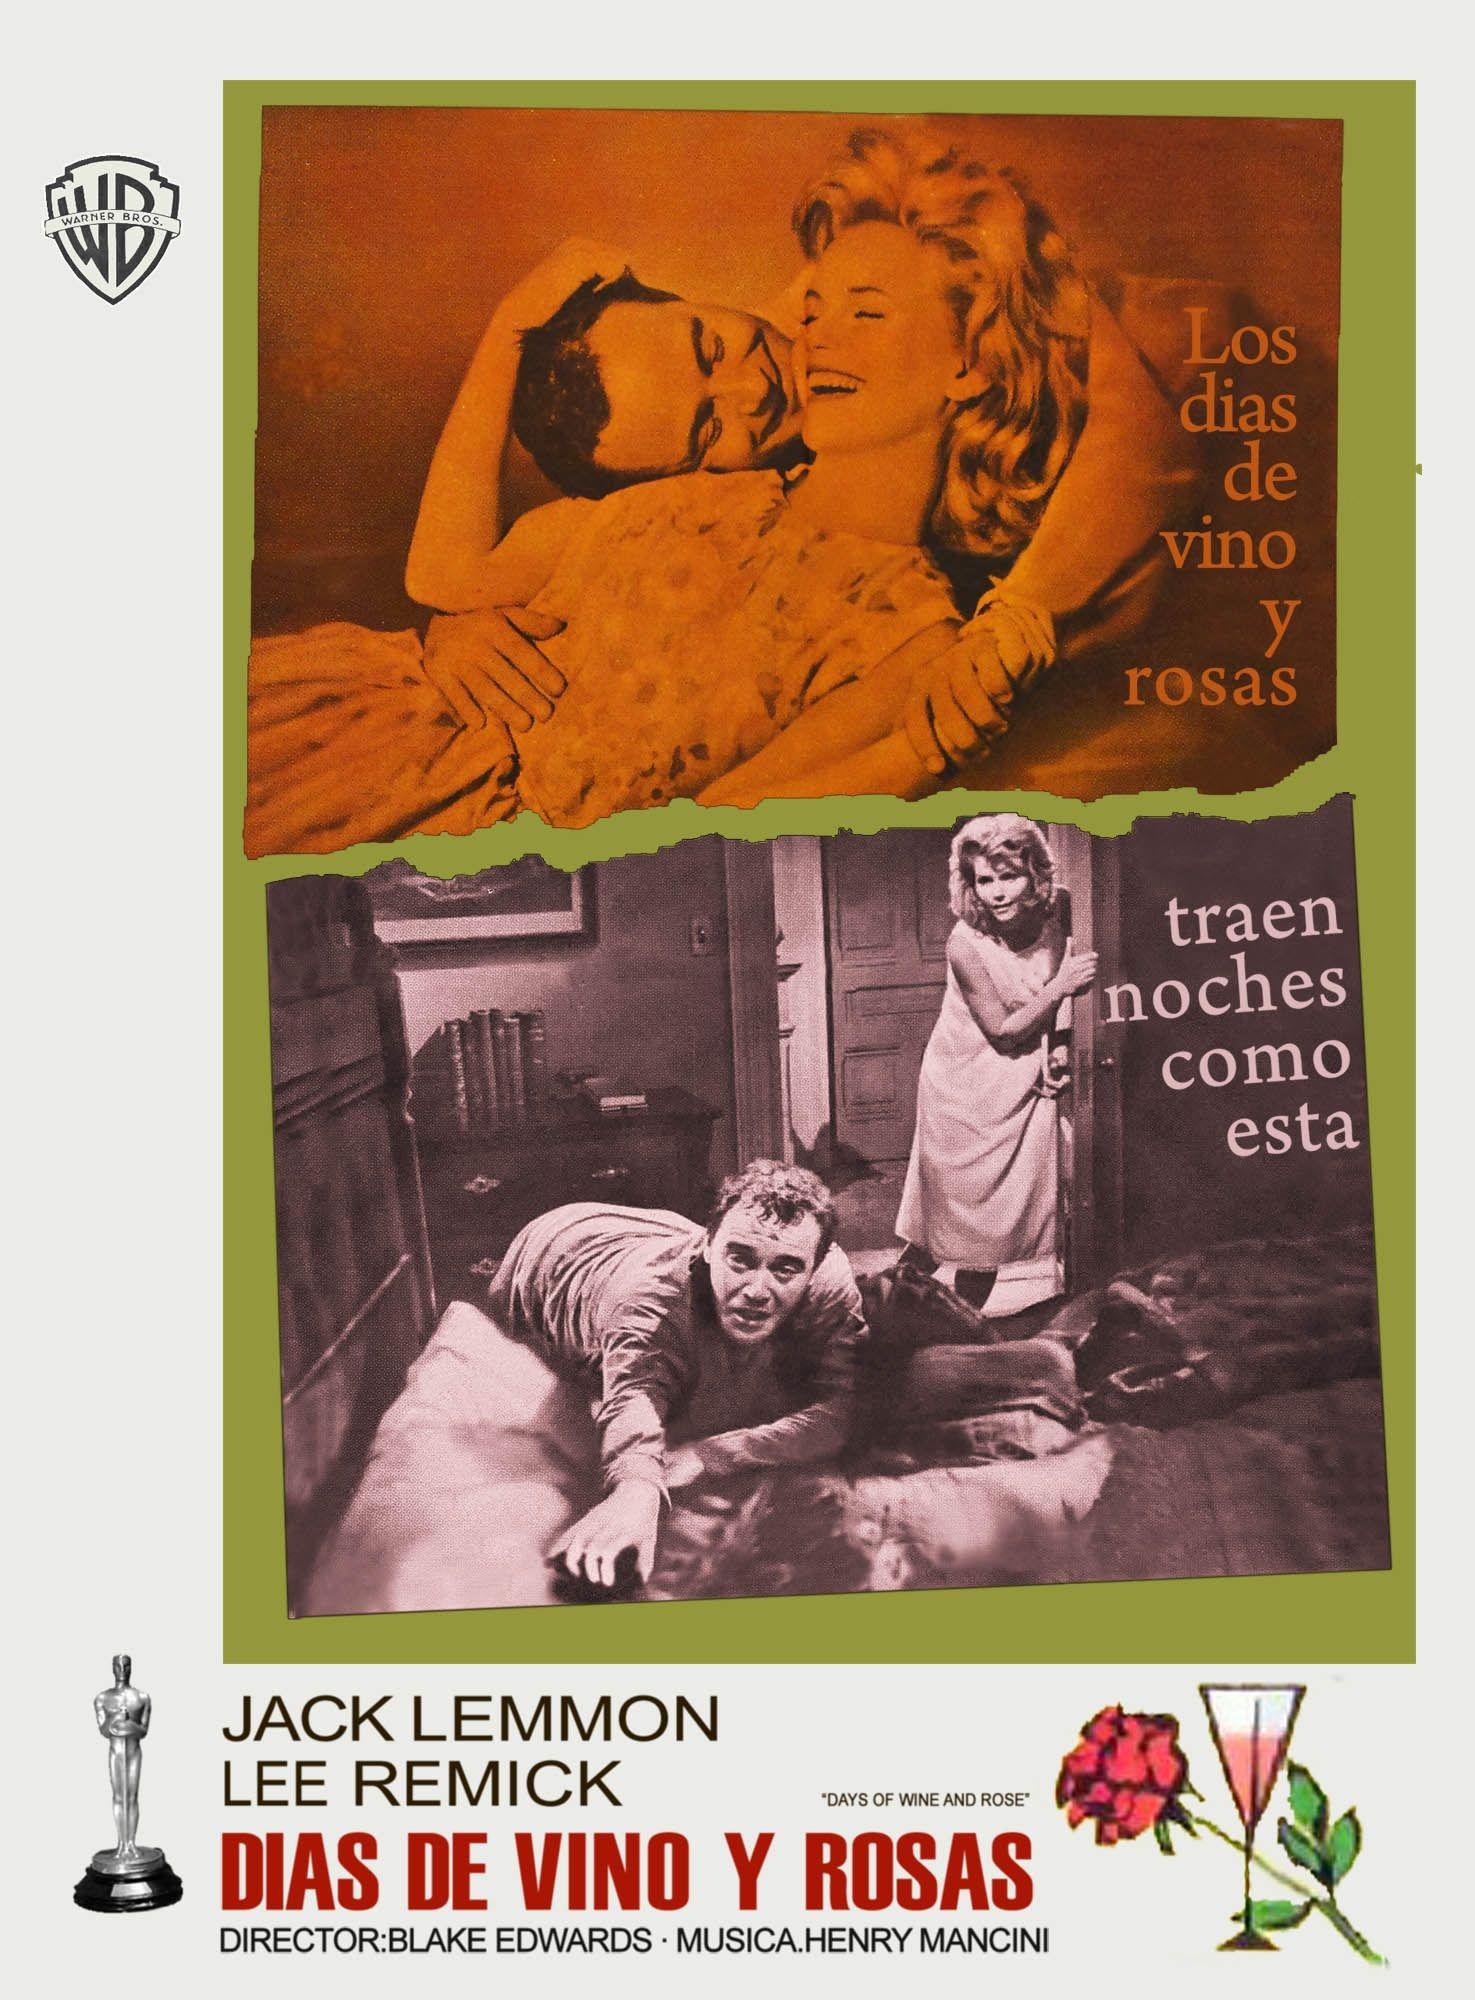 Días de vino y rosas (1962) dirigida por Blake Edwards e interpretada por Jack Lemmon, Lee Remick, Charles Bickford, Jack Klugman, Alan Hewitt, Tom Palmer, Jack Albertson...